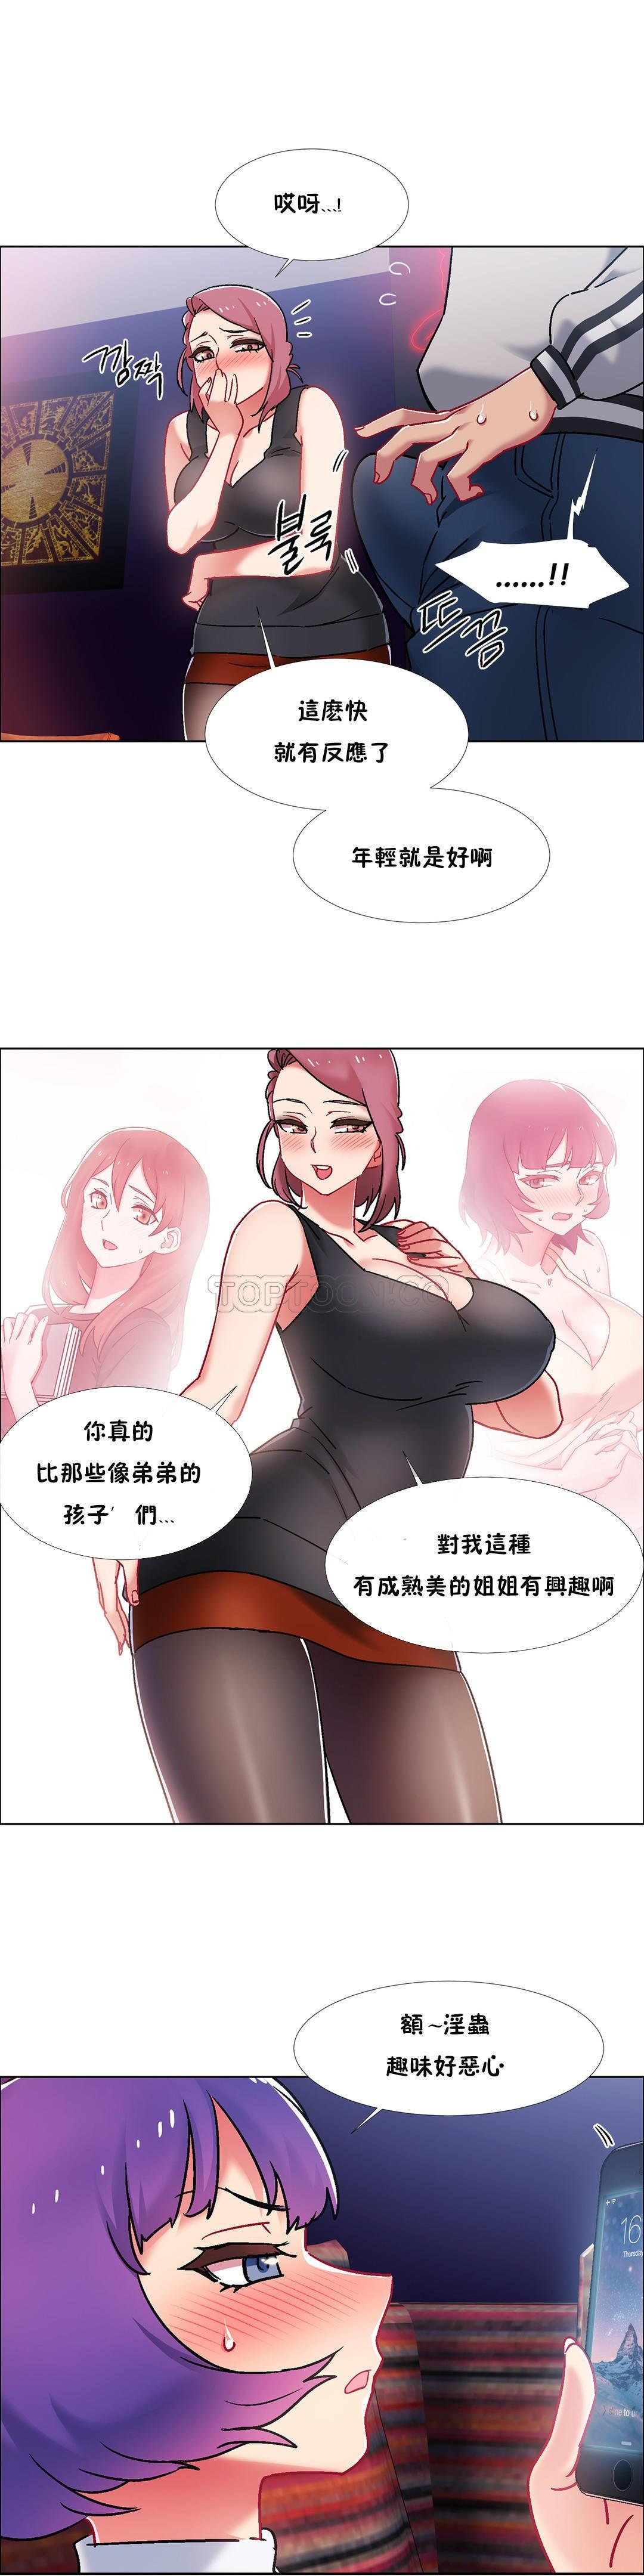 [Studio Wannabe] Rental Girls | 出租女郎 Ch. 33-58 [Chinese]  第二季 完结 225